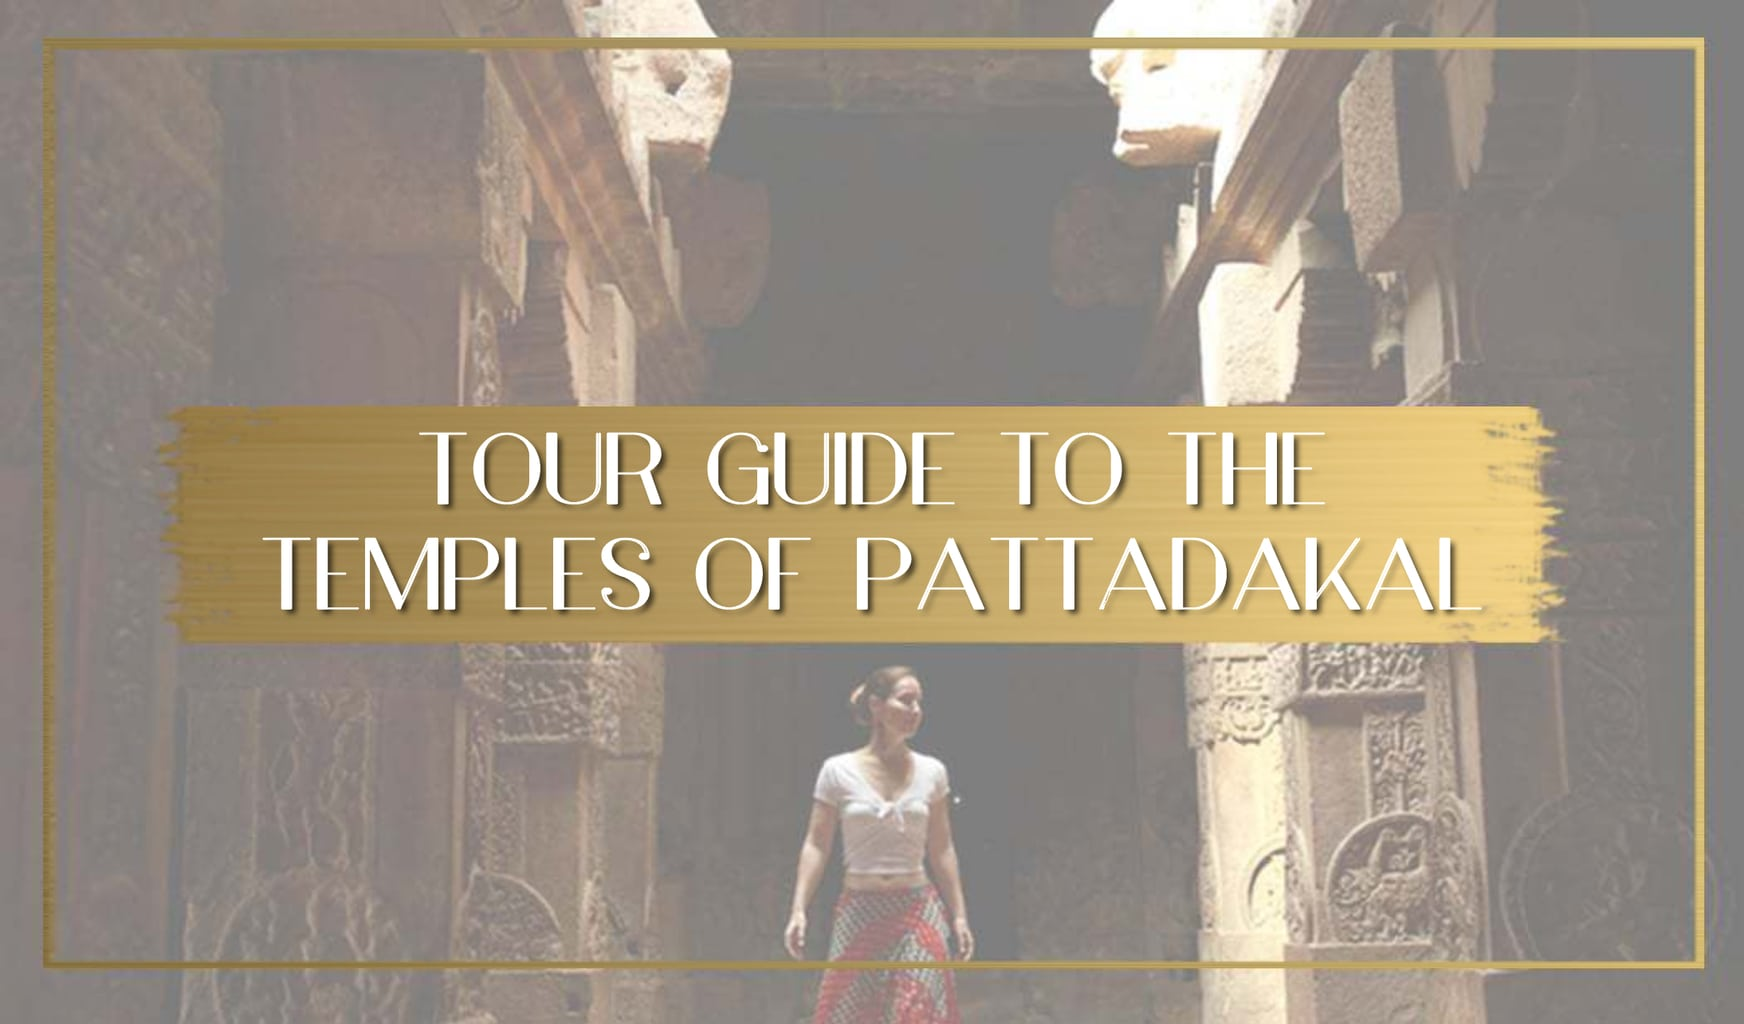 Temples of Pattadakal main